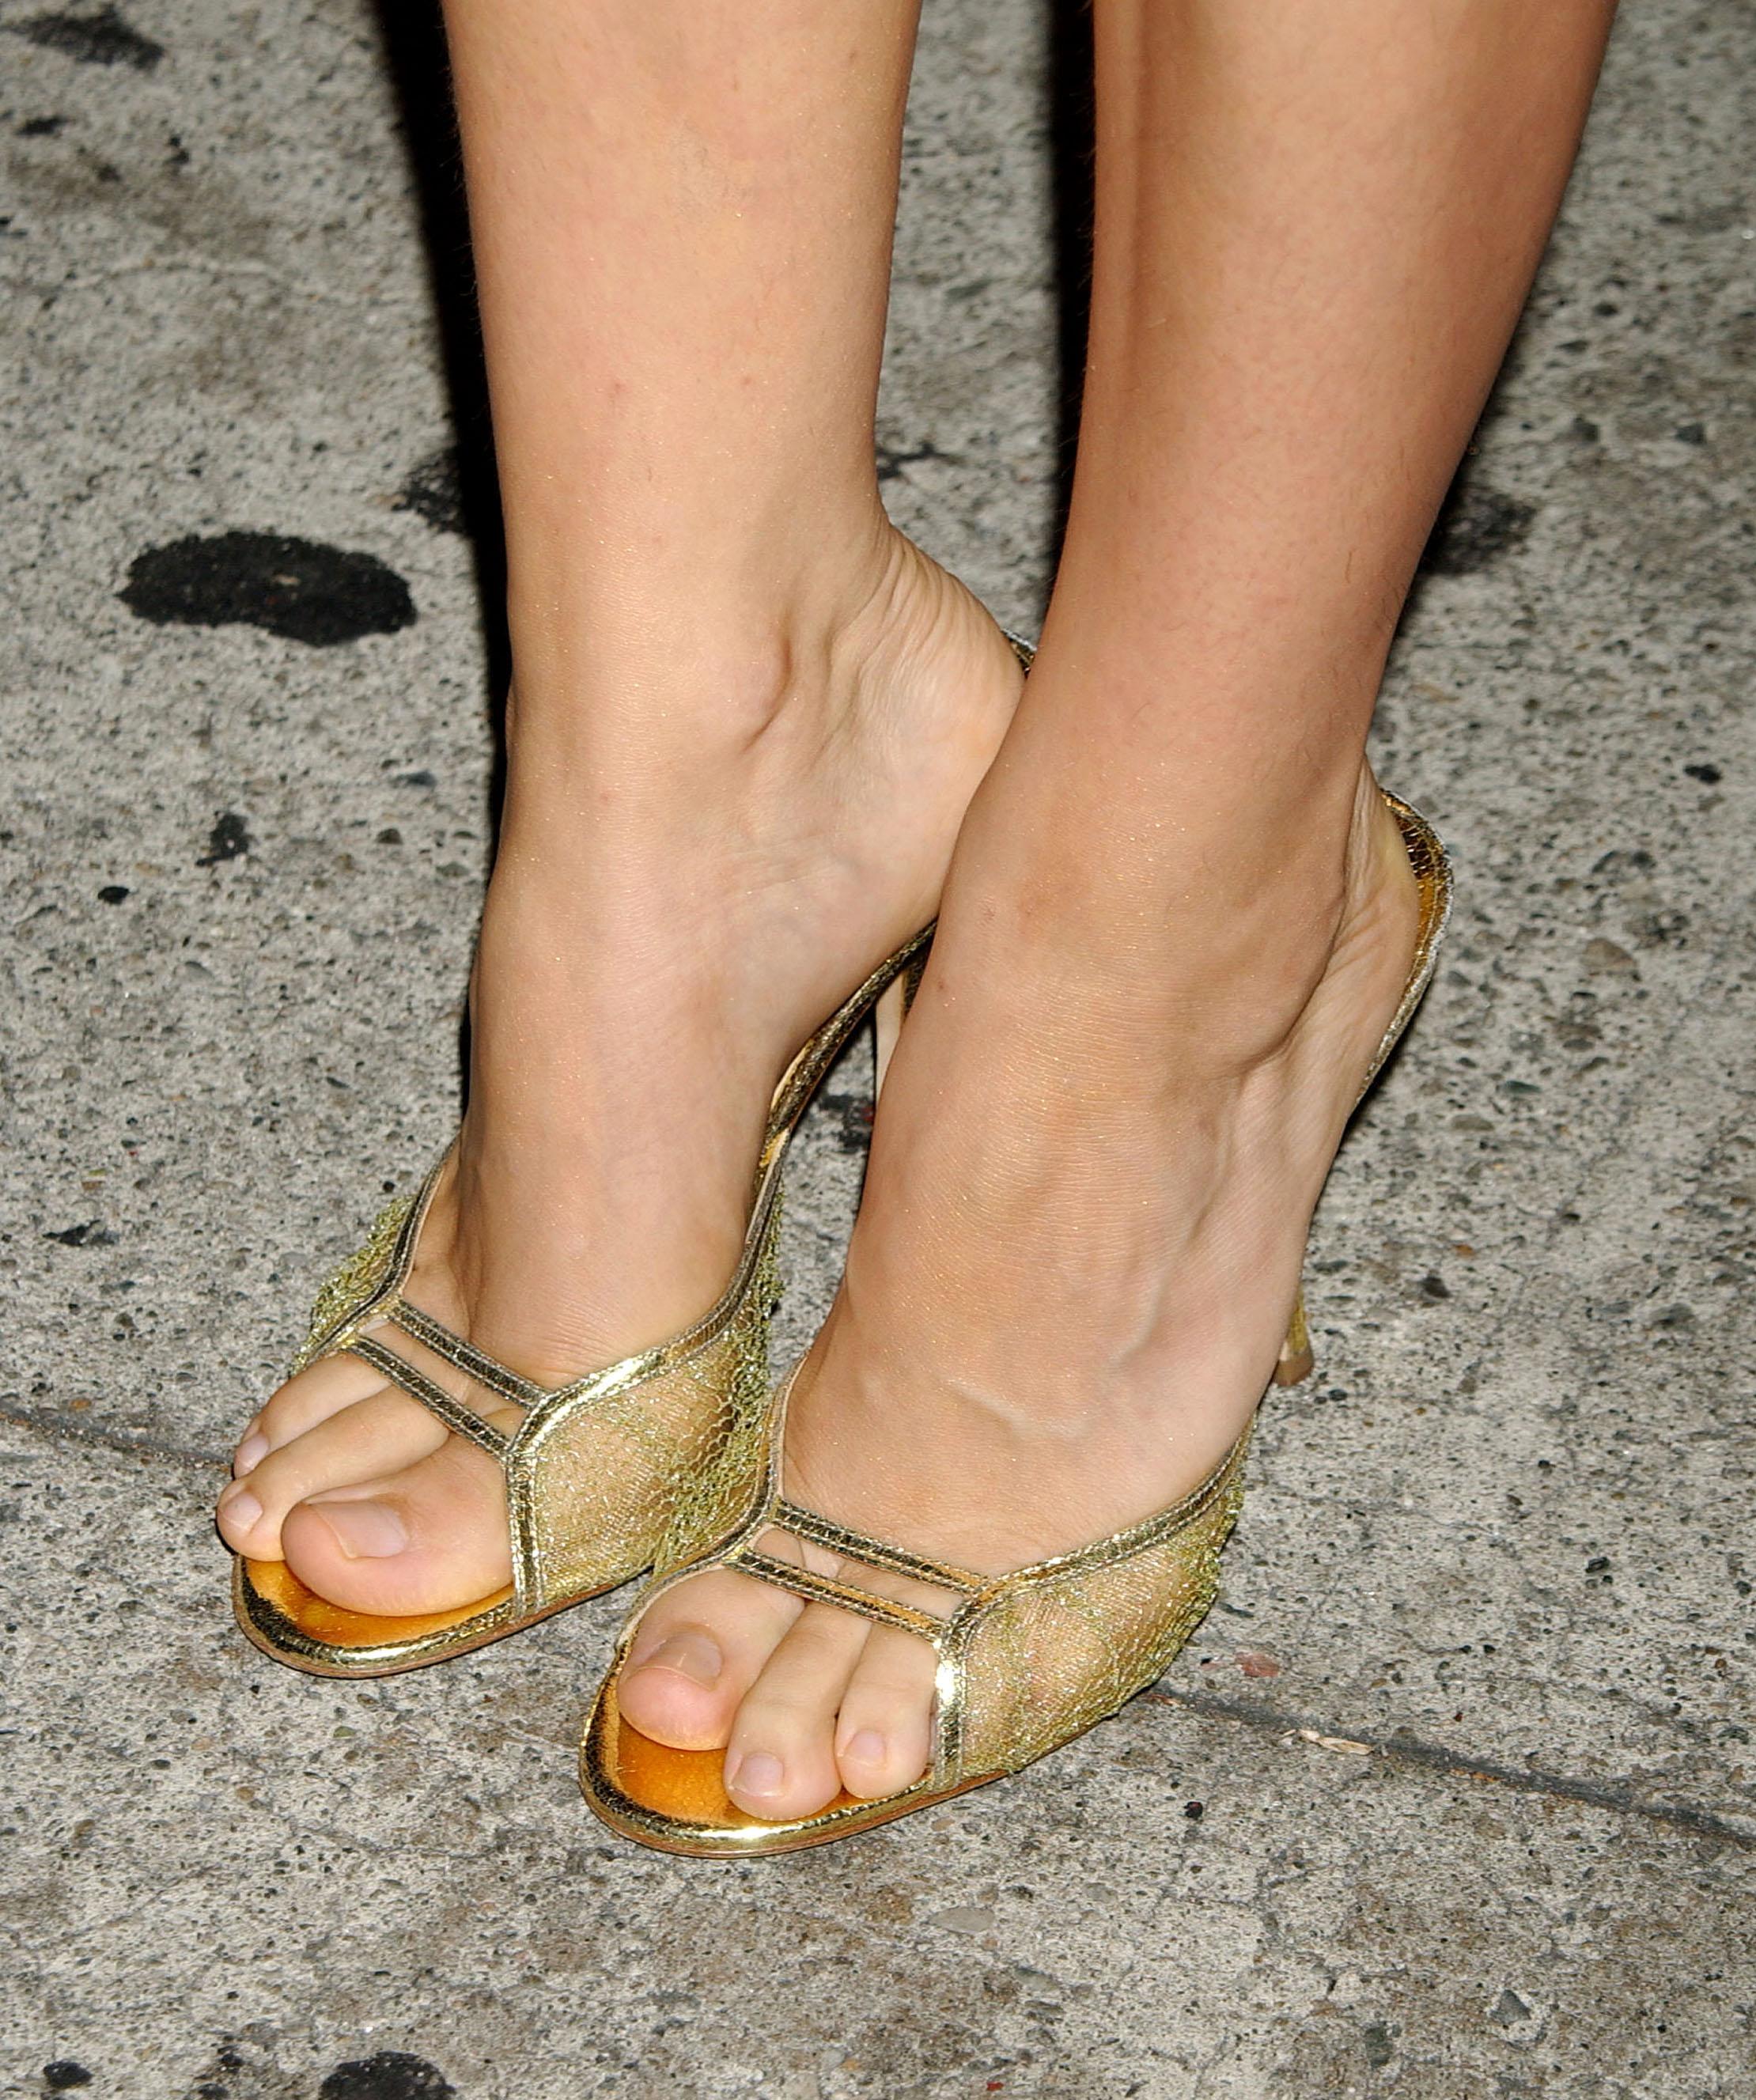 Alicia Keys Shoe Size